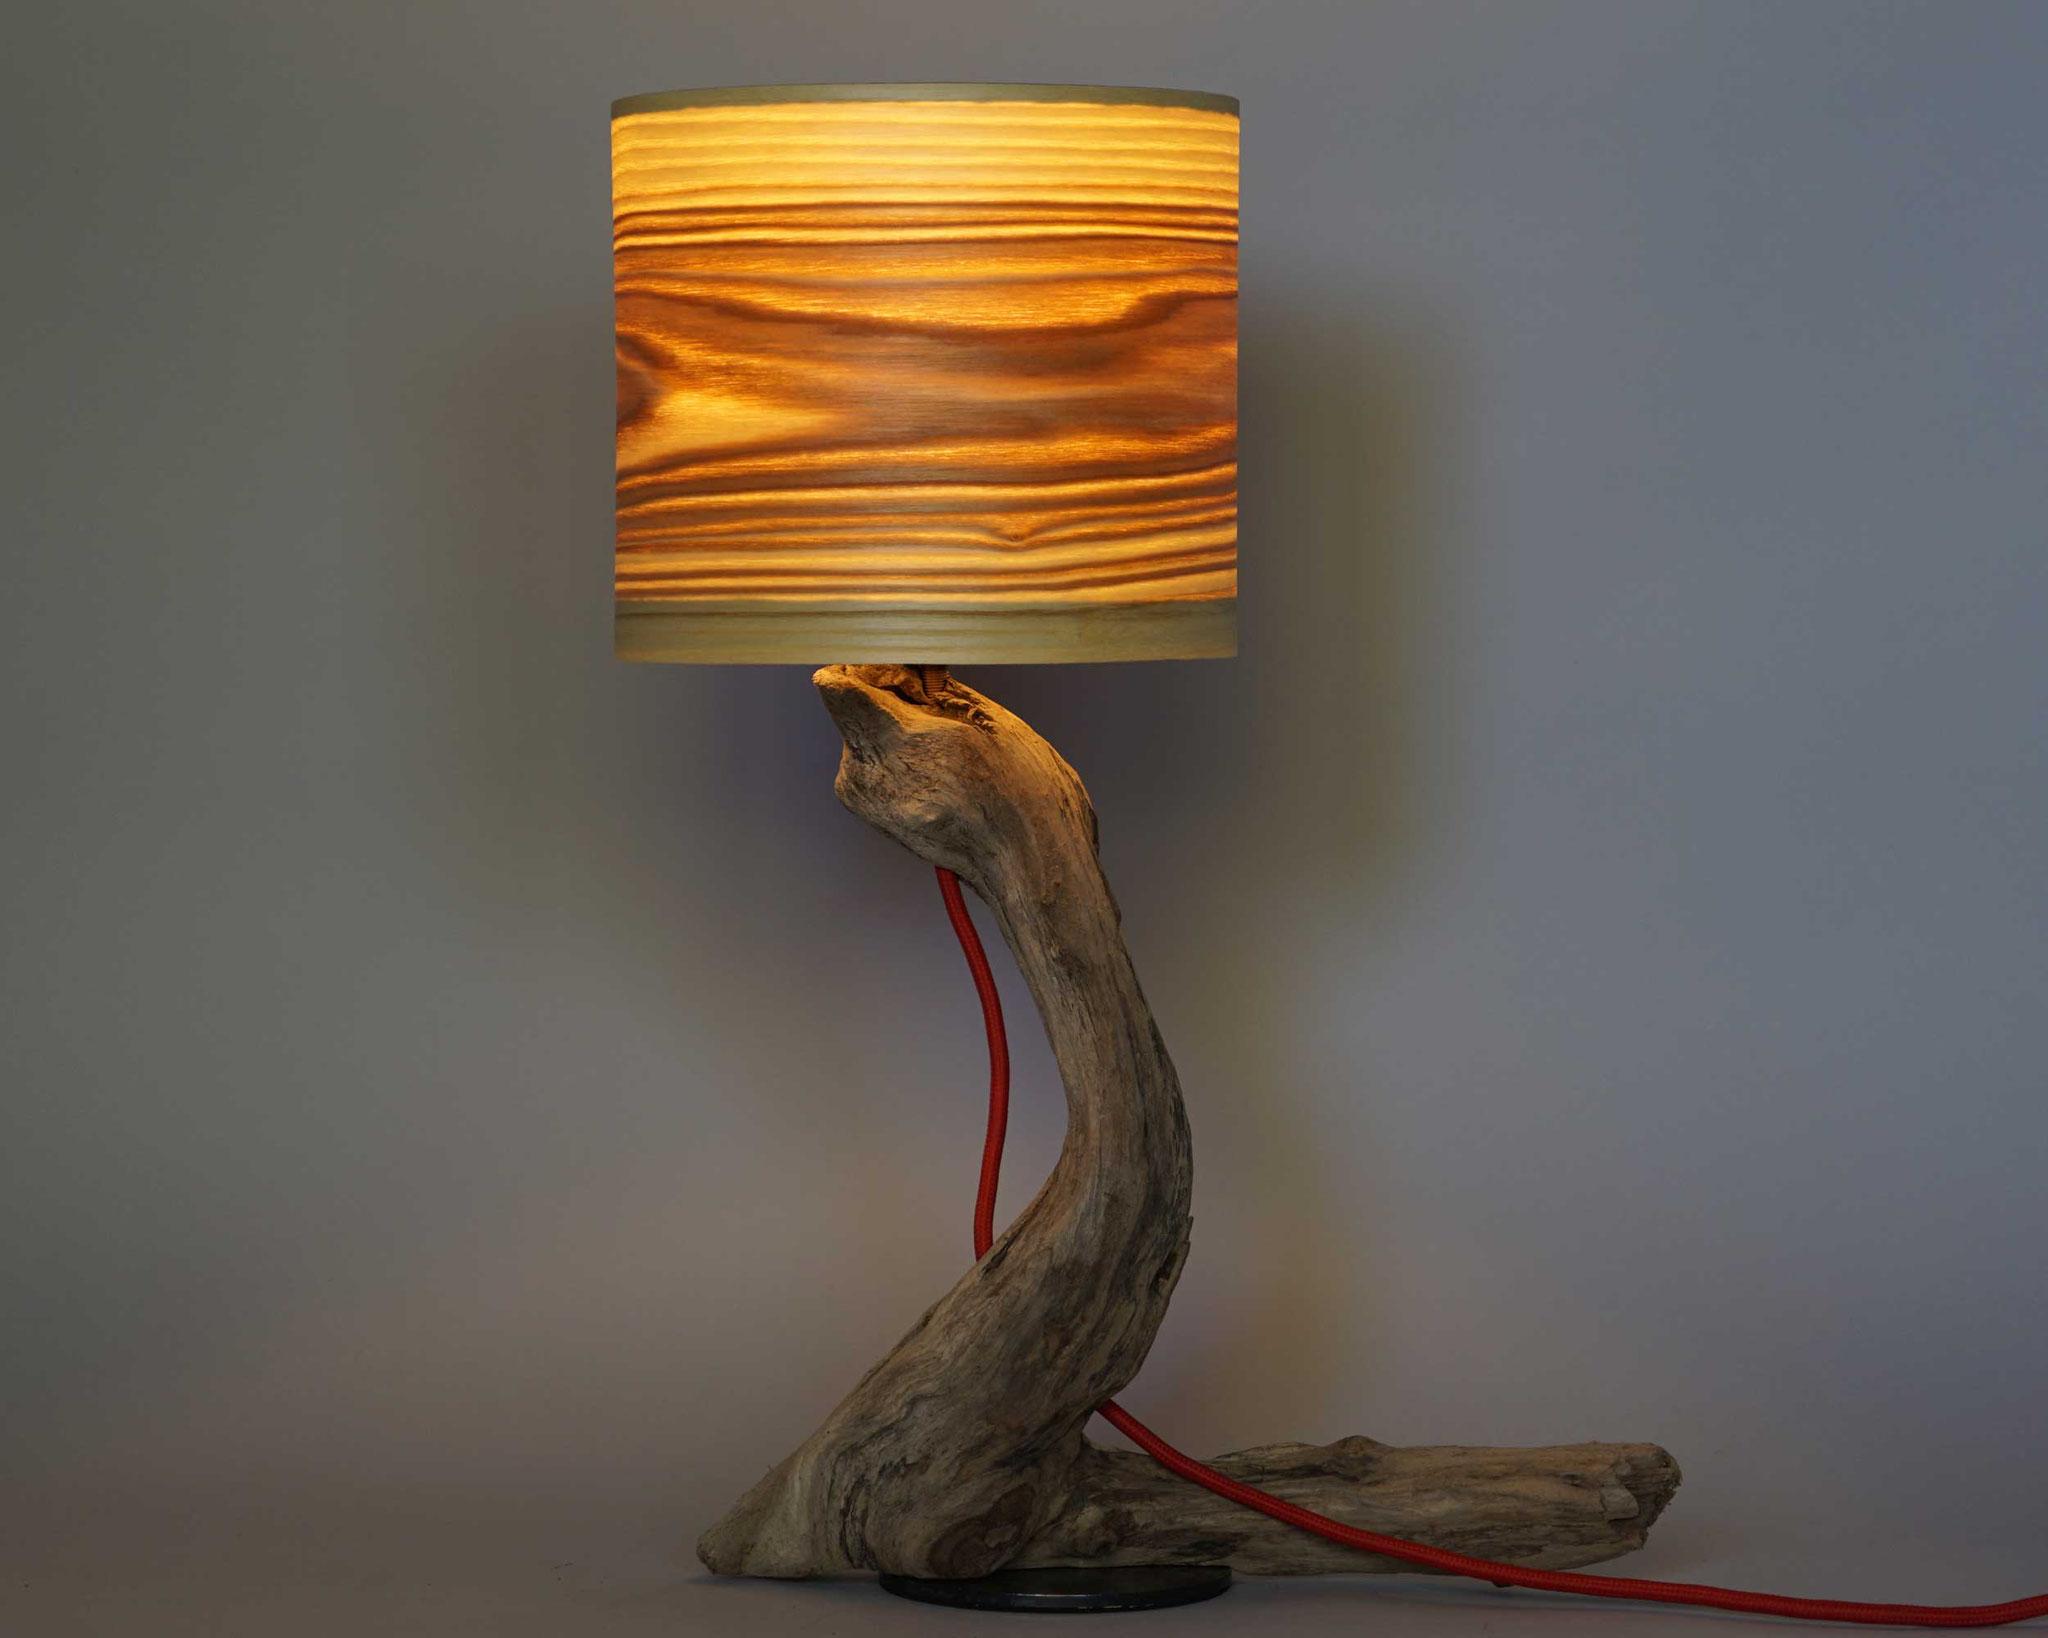 Upcycling Tischlampe Portentum